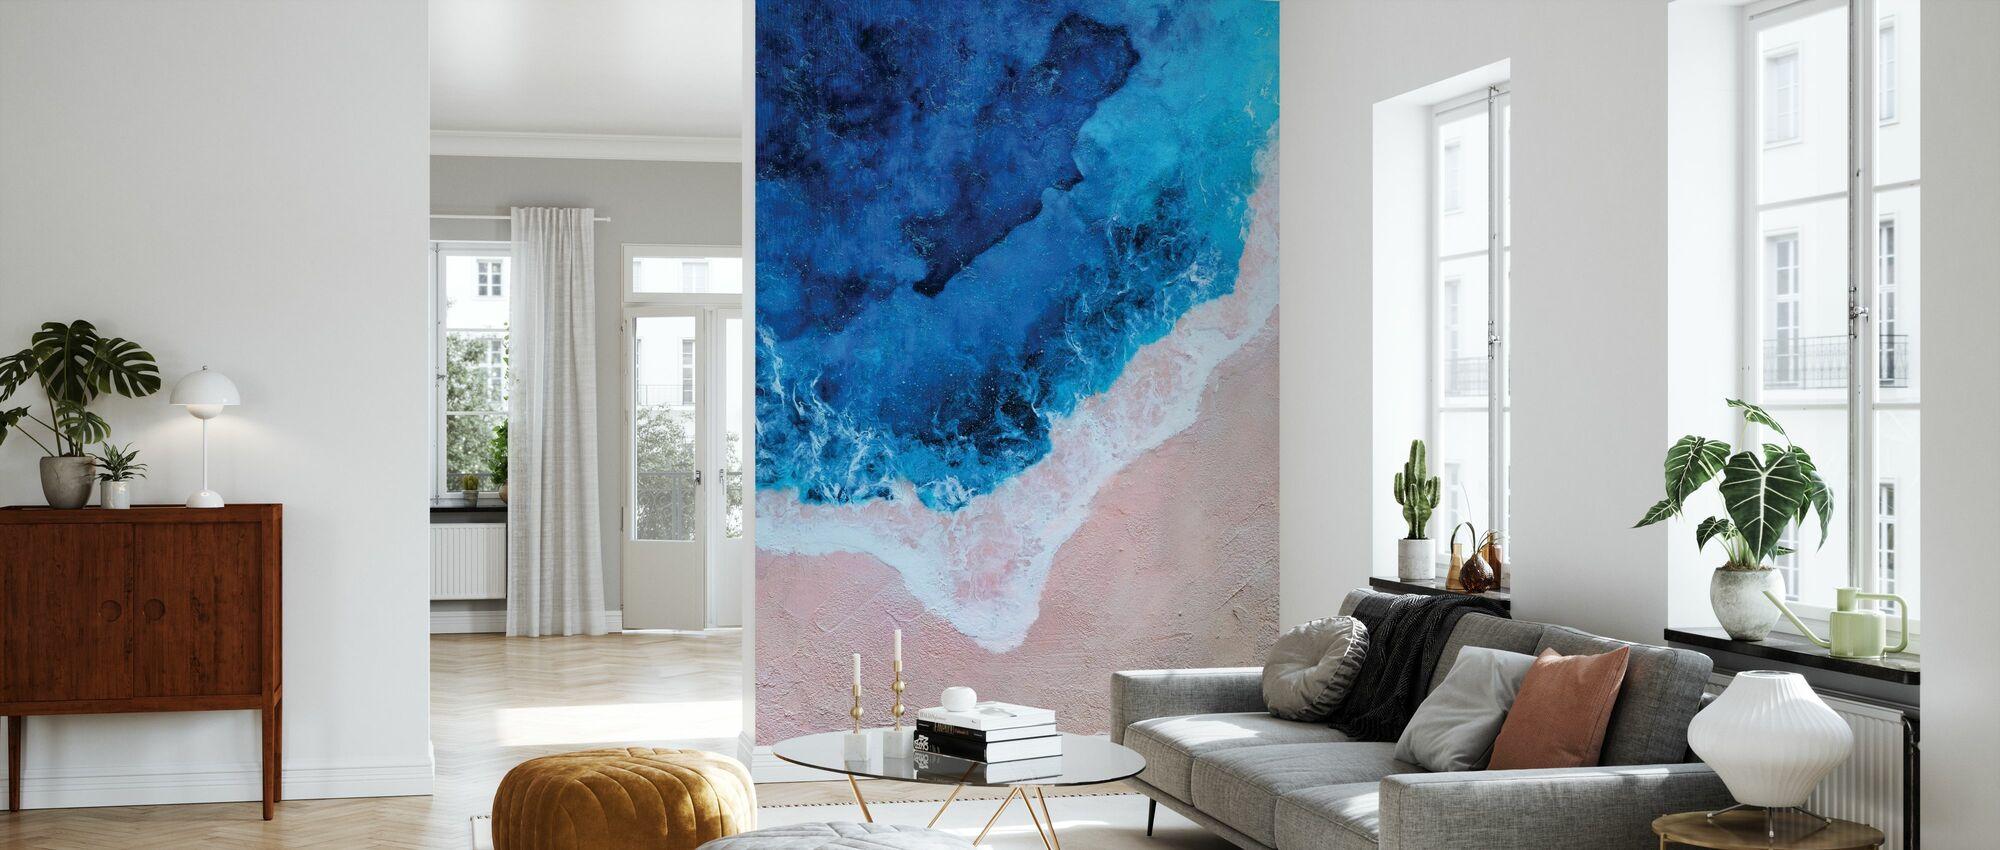 Oasis - Wallpaper - Living Room